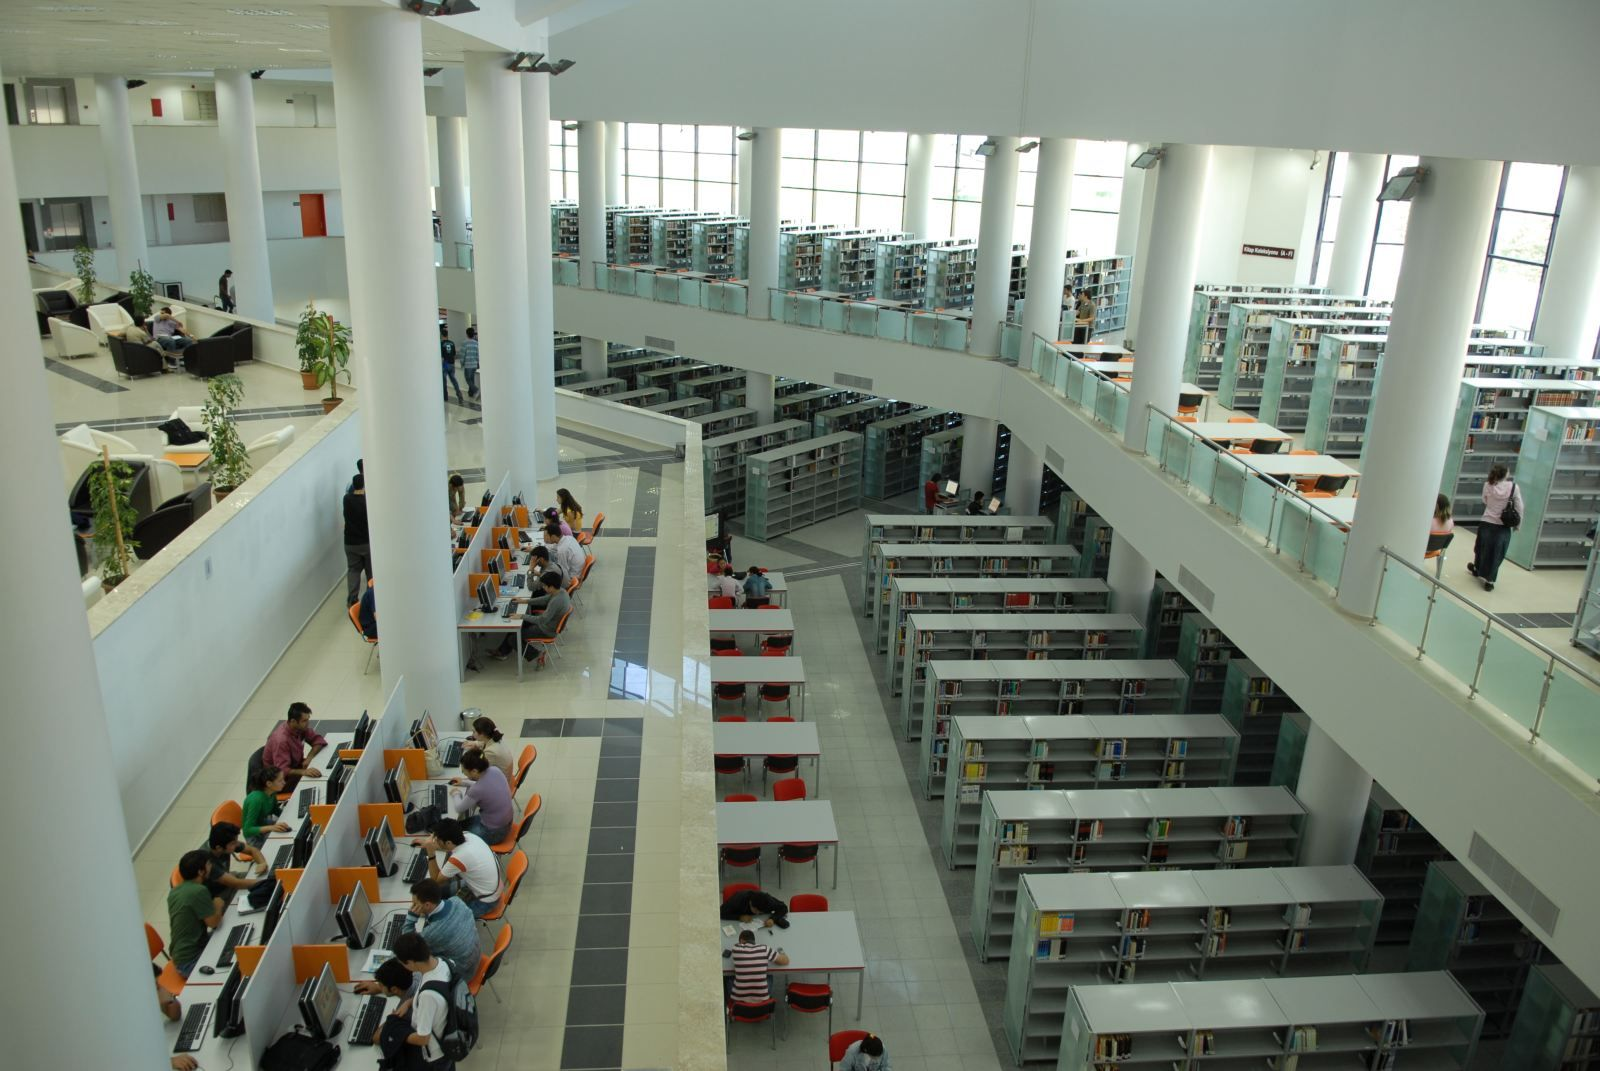 Suleyman Demirel Universitesi Kutuphanesi Nenerede Web Sitemiz Www Nenerede Com Tr Suleyman Restoran Otomobil